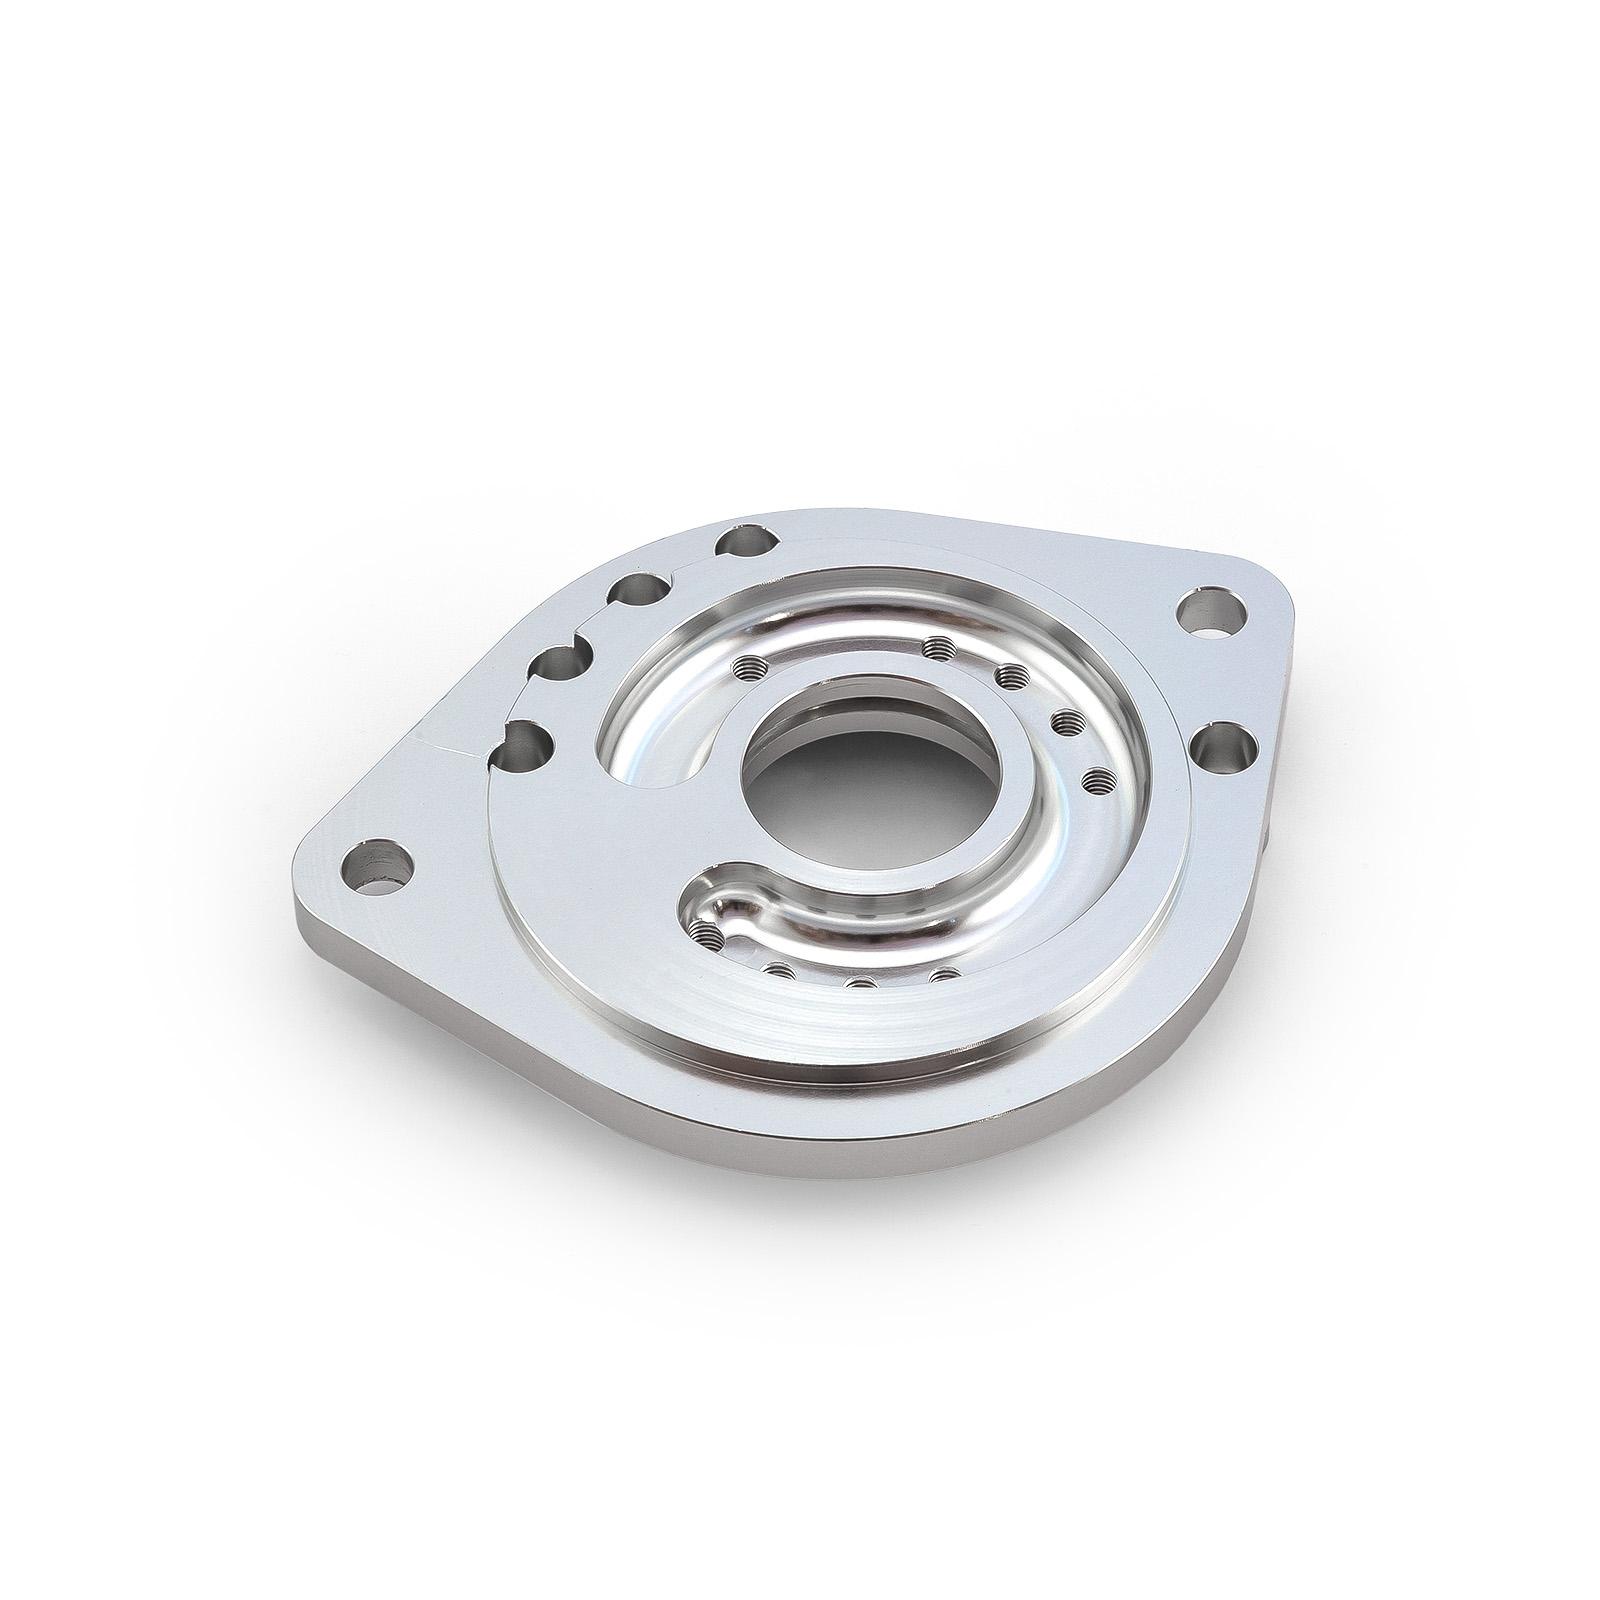 Ford SB 302 351 Windsor Cleveland 2 Bolt Replacement Starter Mounting Block - Blue